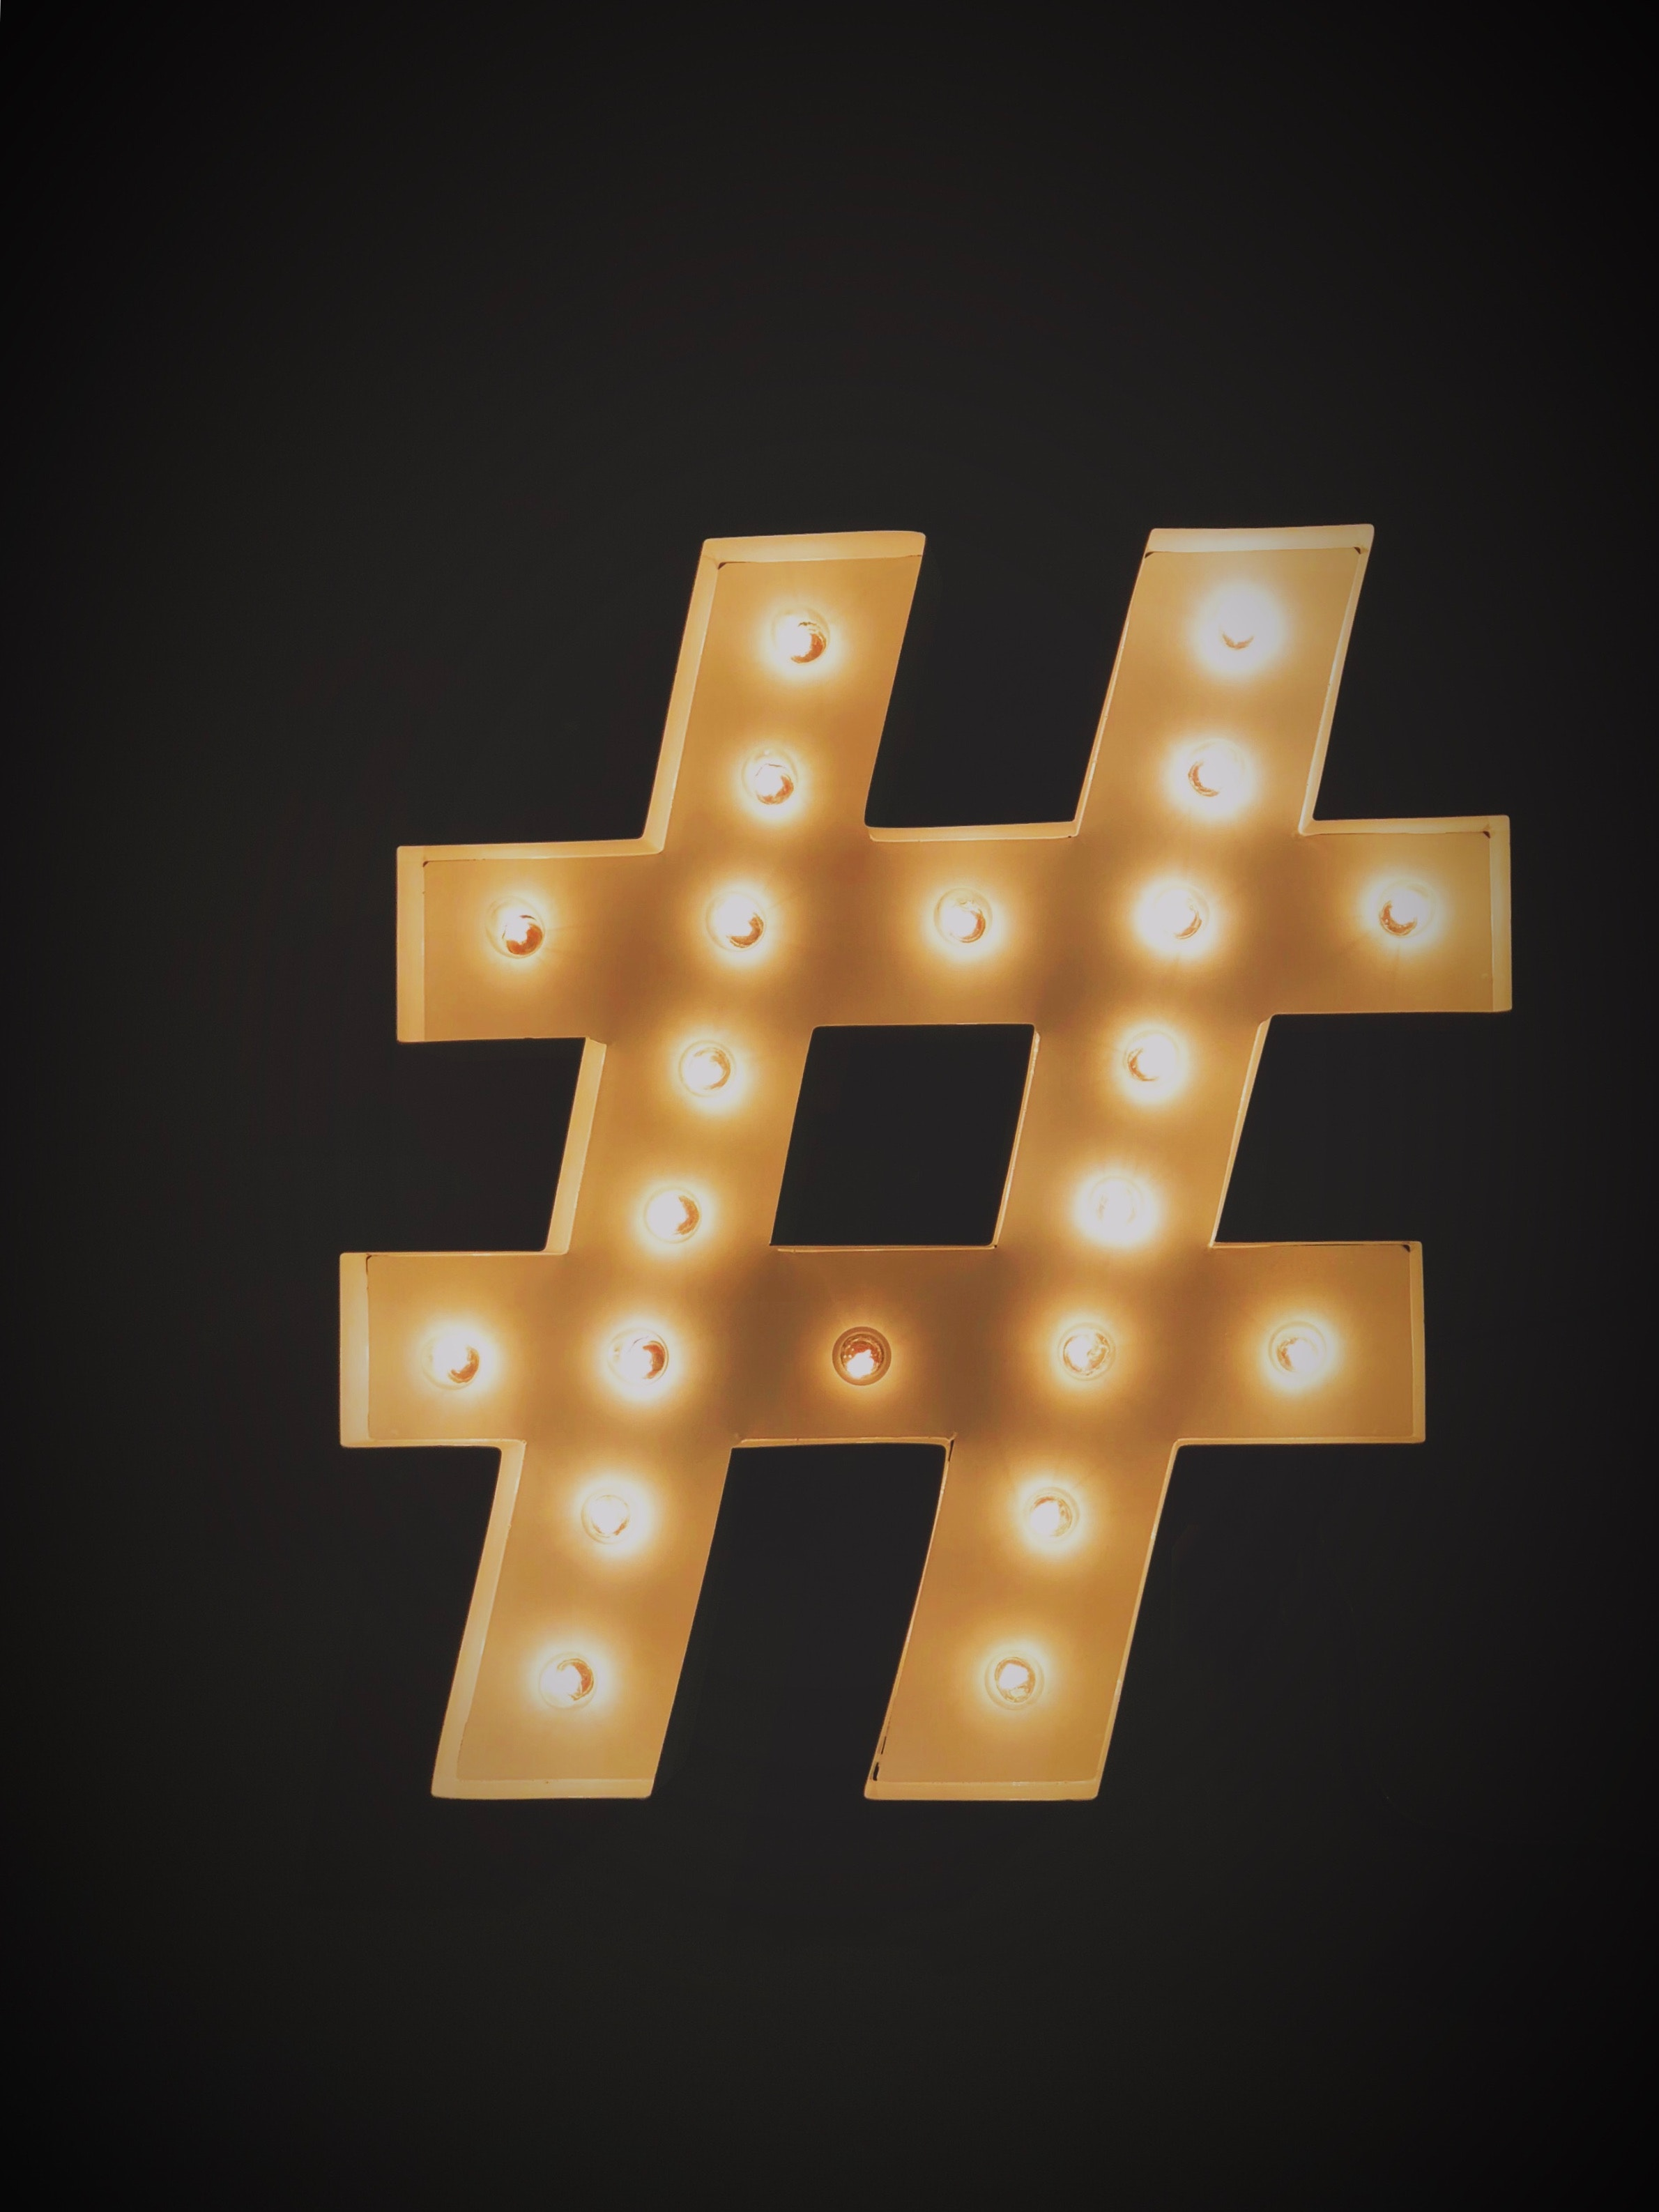 social-media-hashtags-virtual-assistant